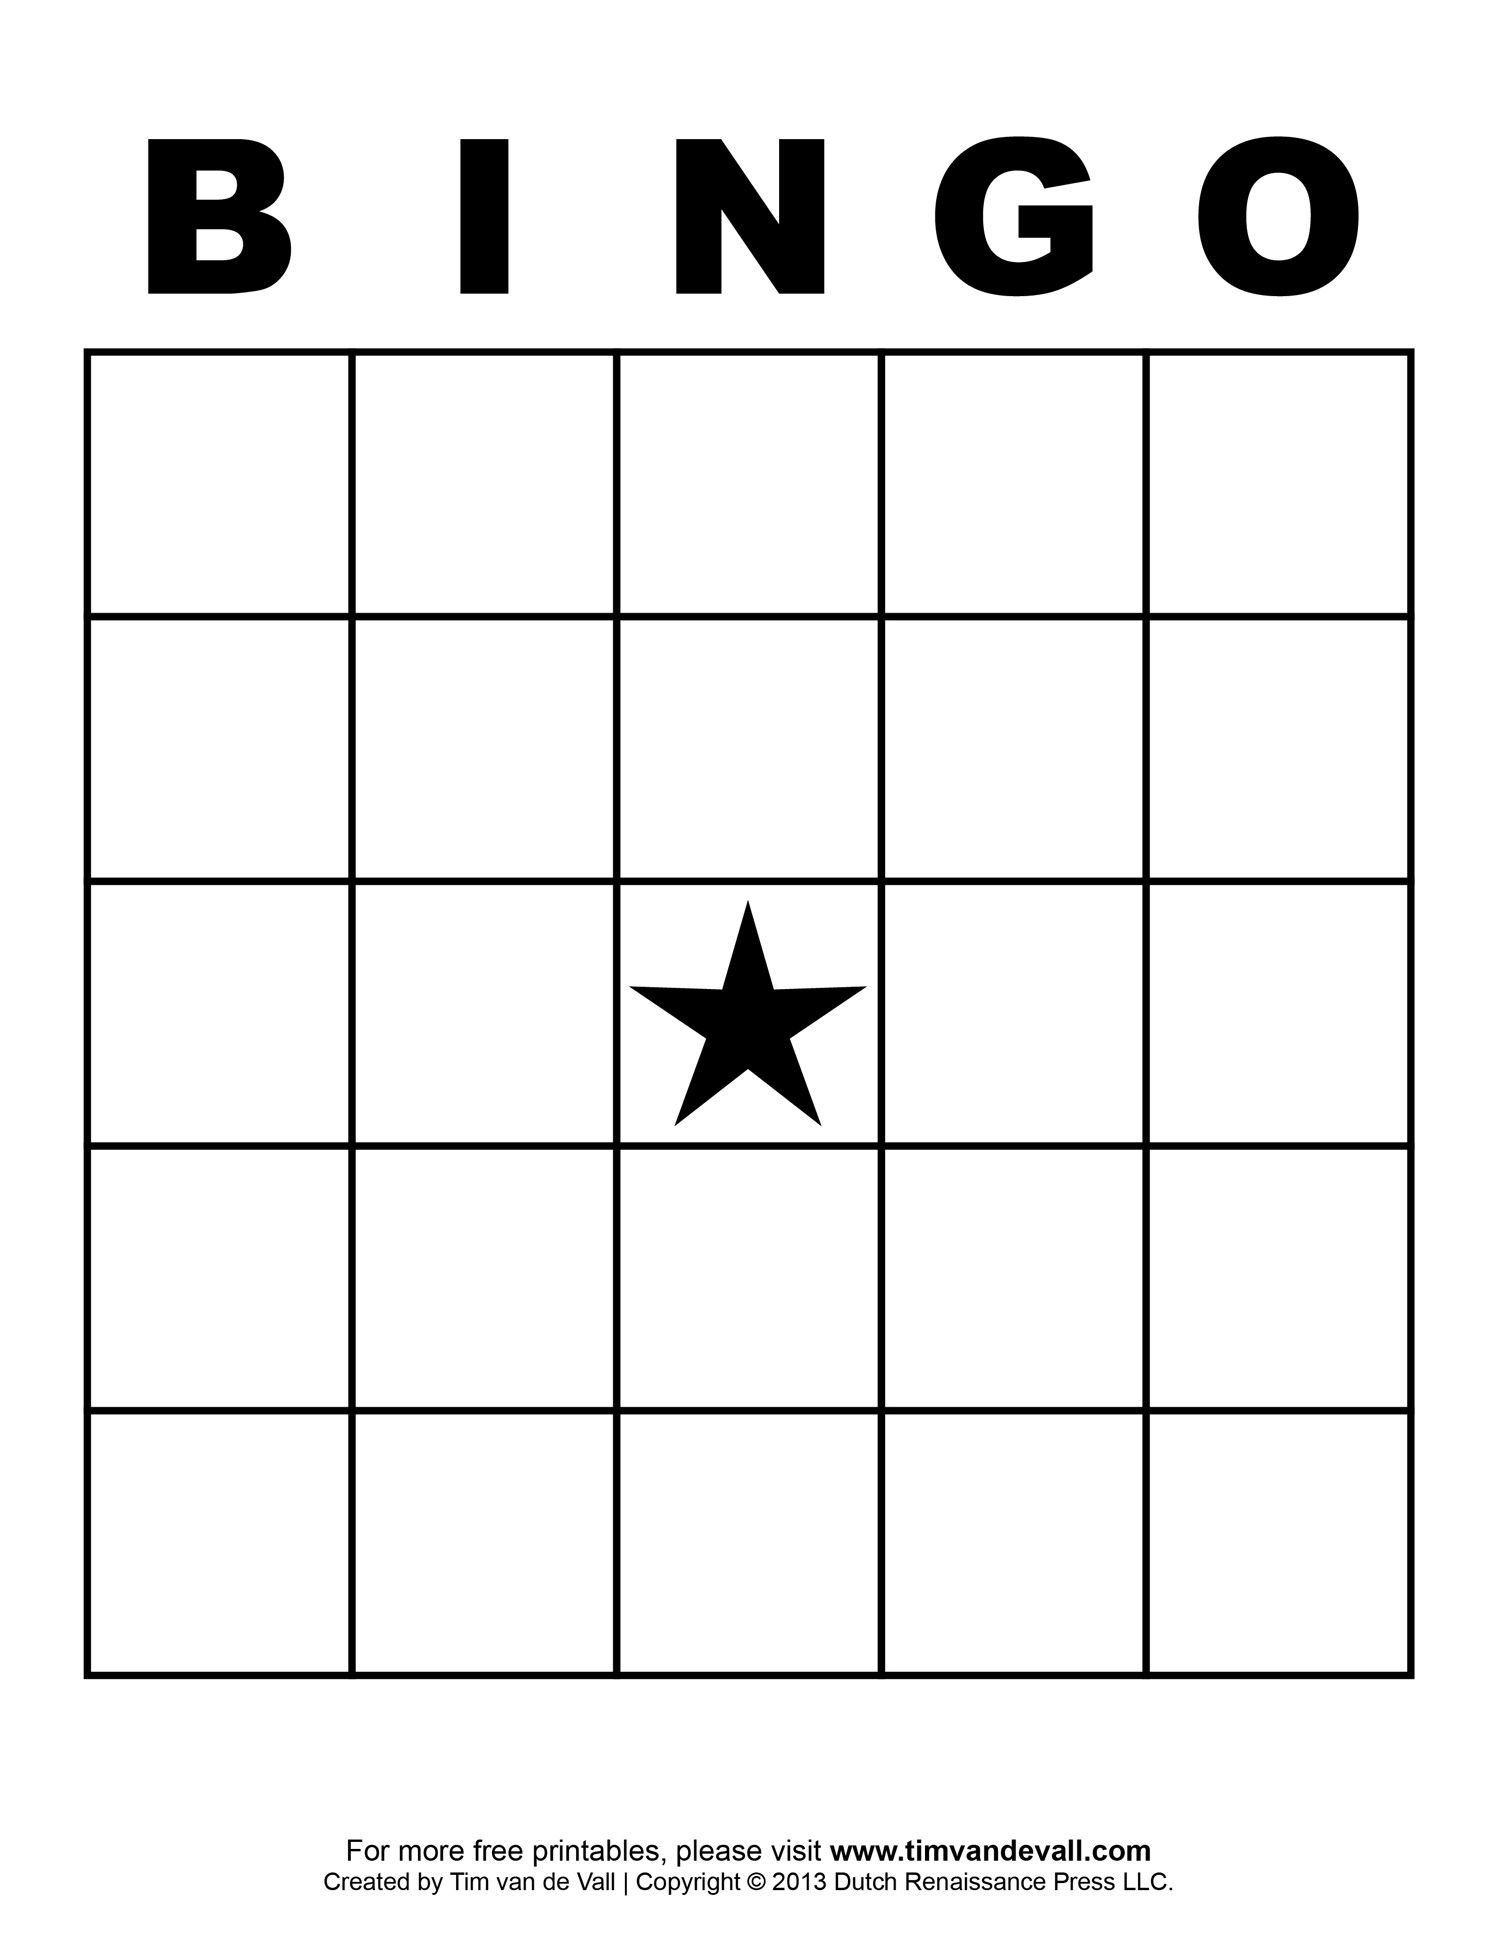 Free Printable Blank Bingo Cards Template 4 X 4 | Classroom | Blank - Free Printable Bingo Games